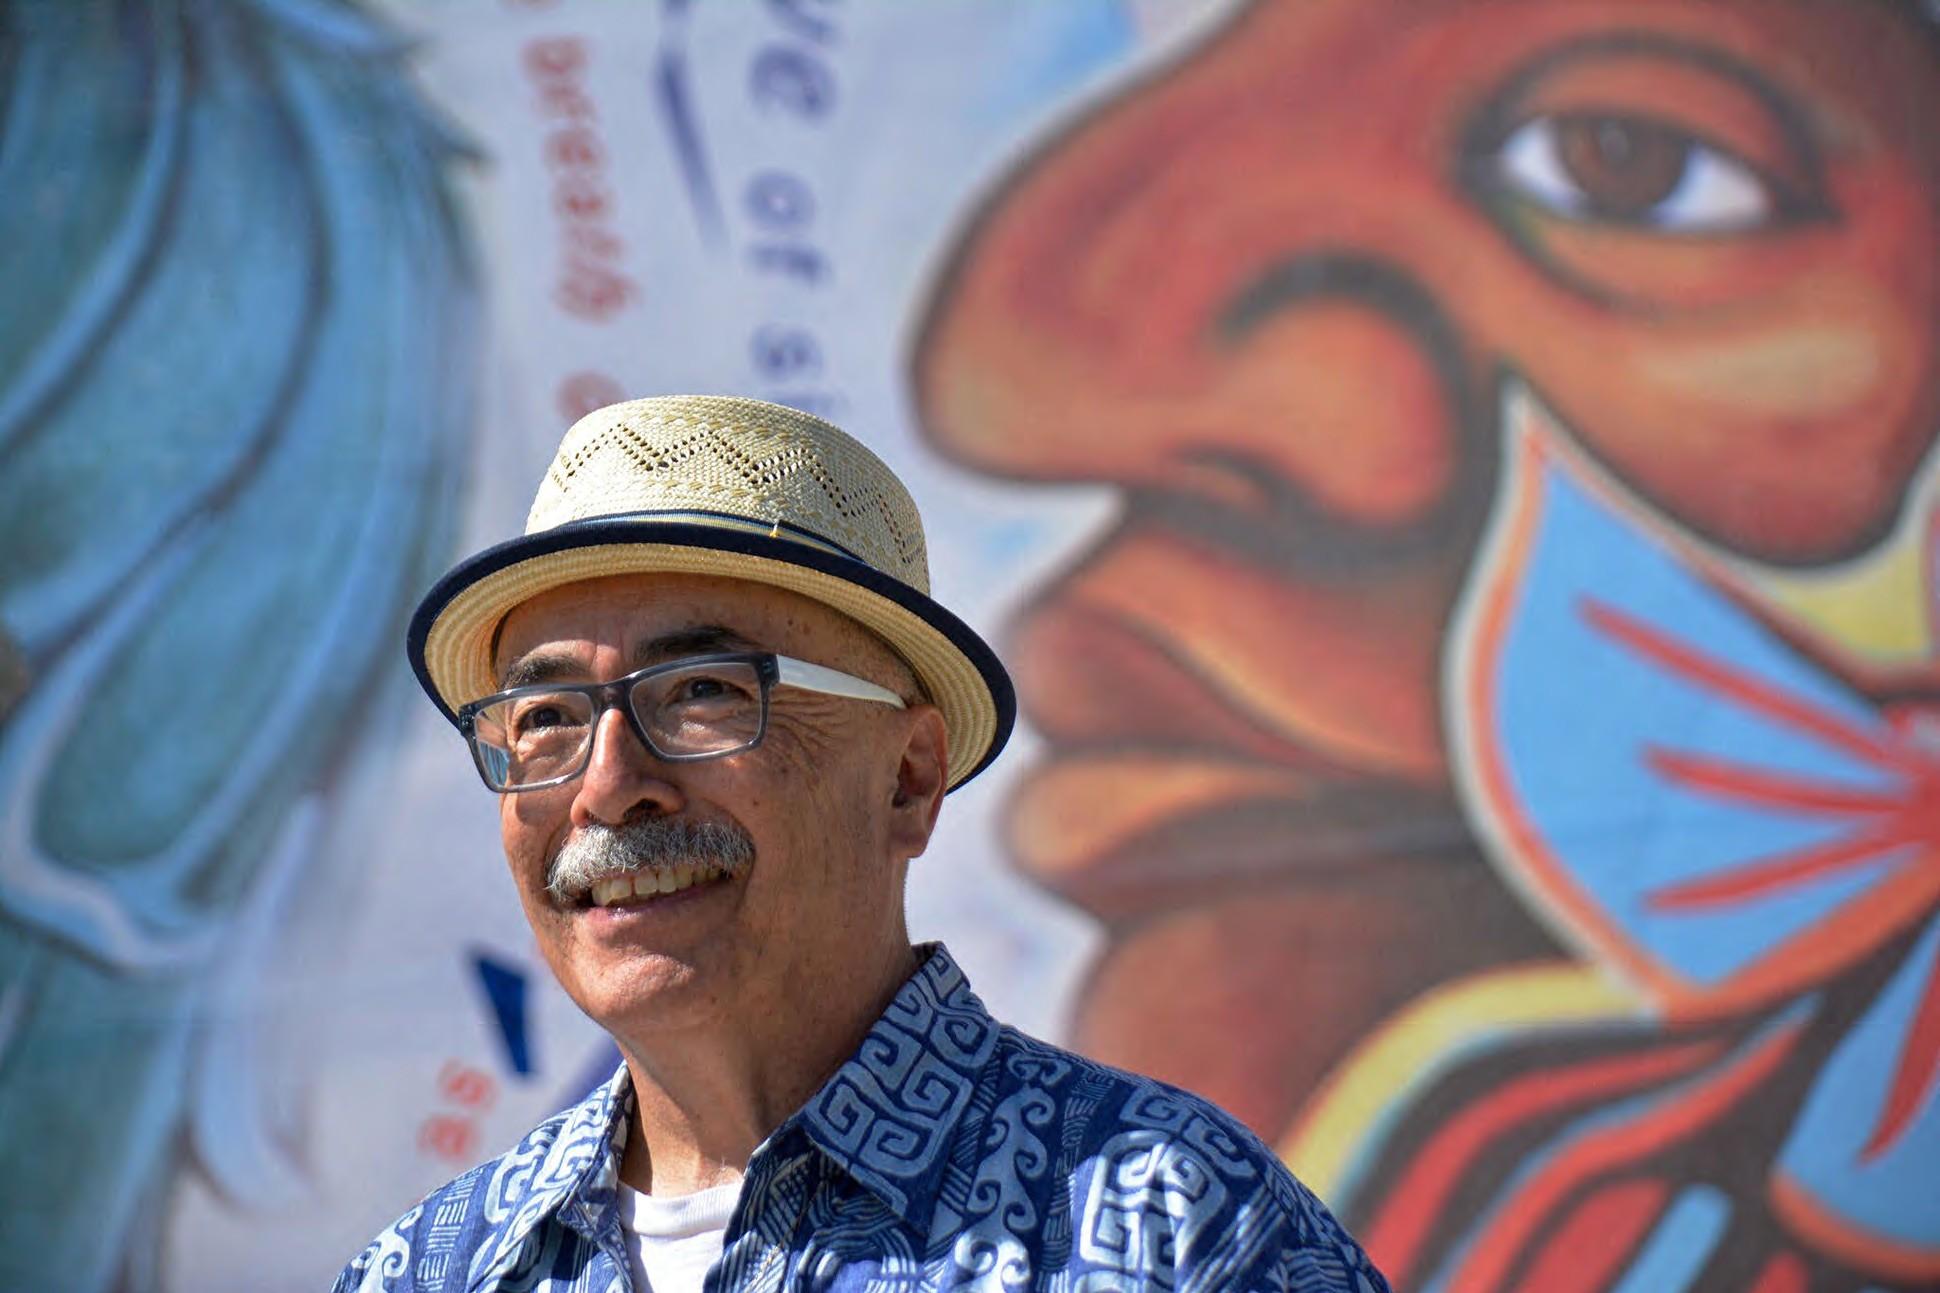 Image of Juan Felipe Herrera